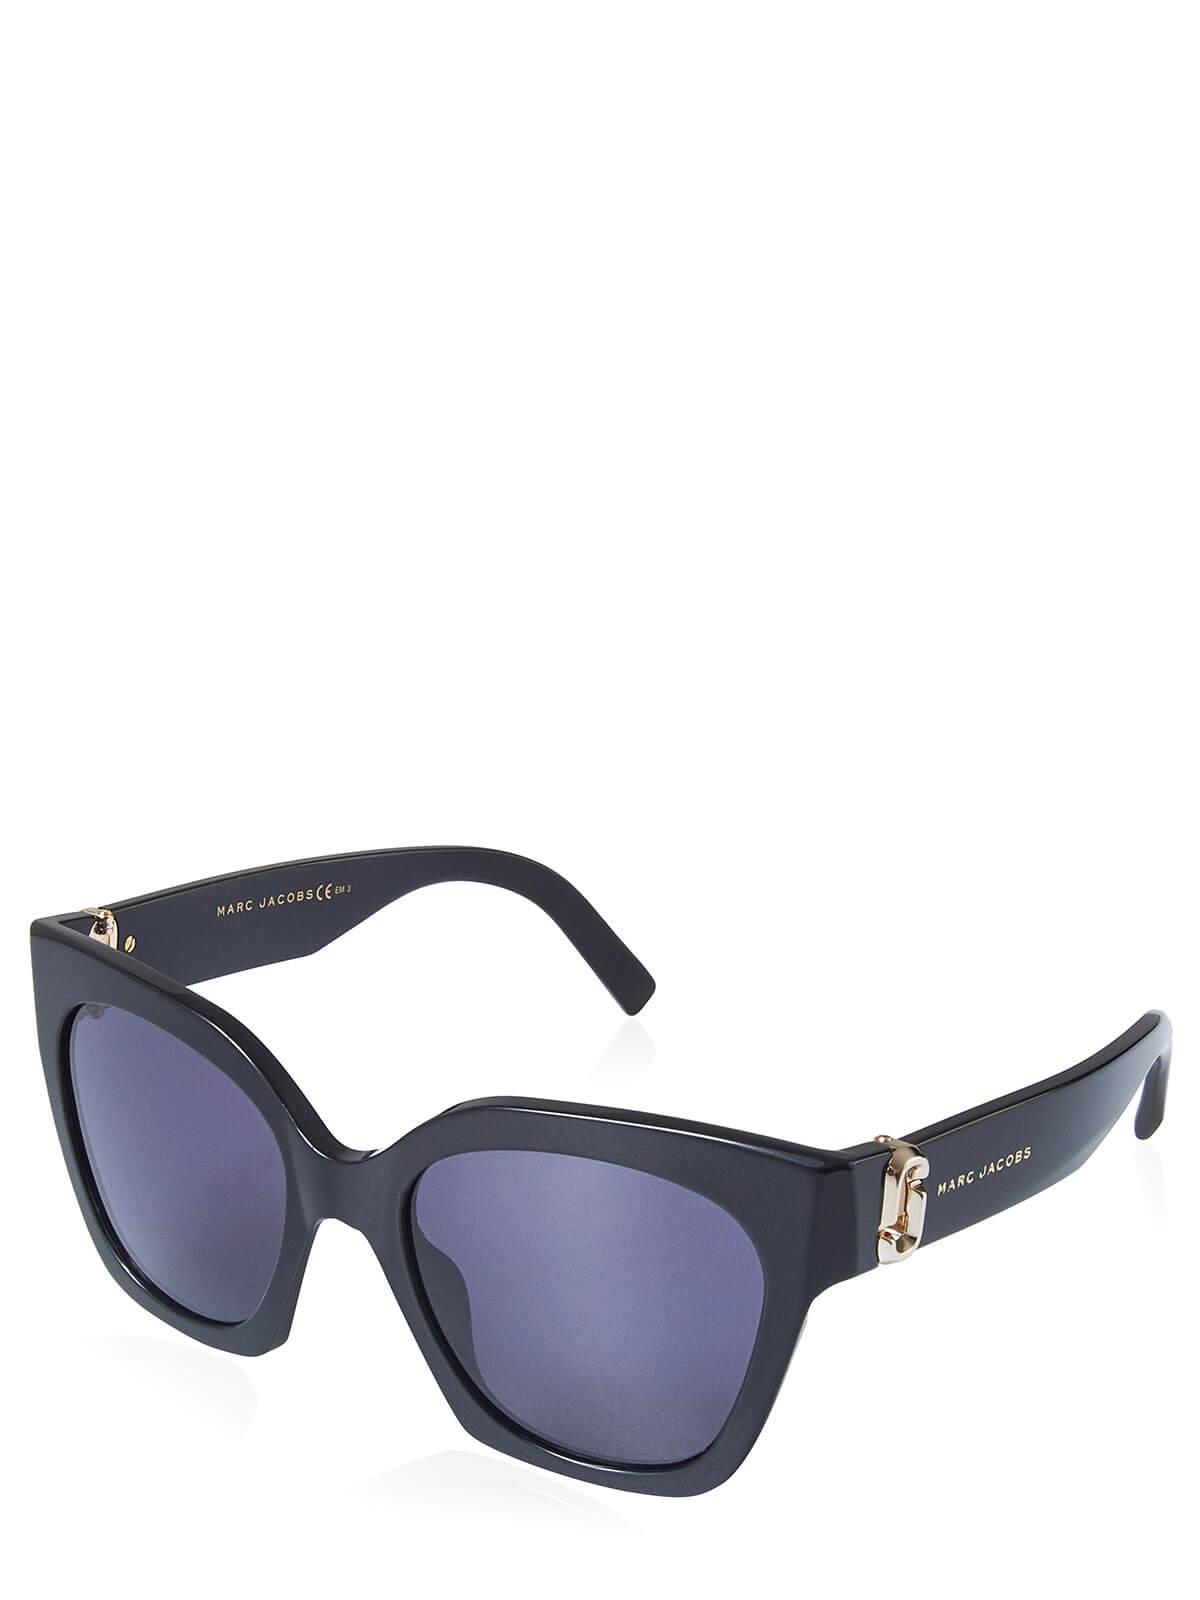 8099fd9ca2f2 Marc Jacobs Sunglasses black | Fashionesta online shop